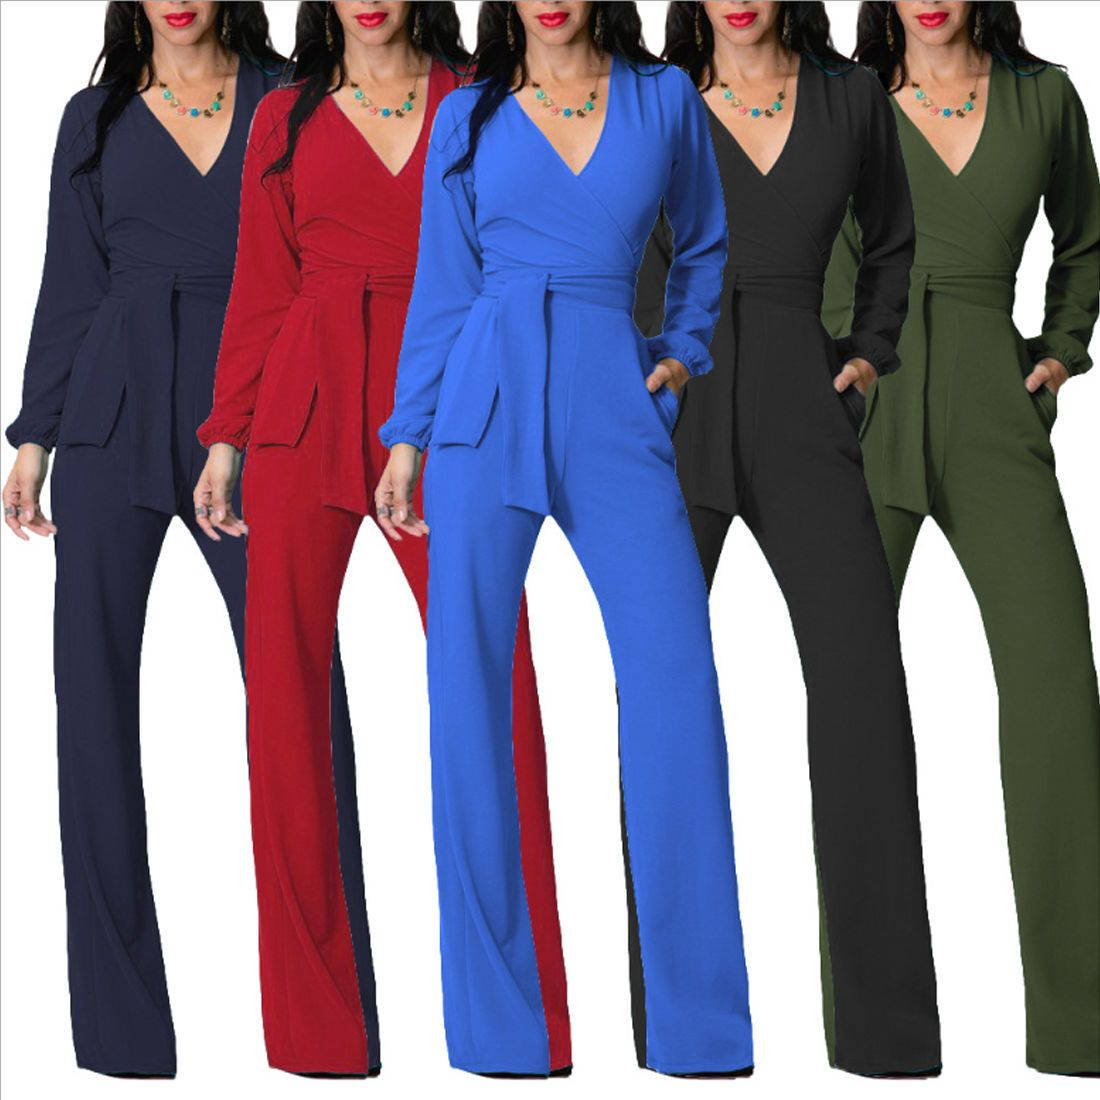 cfa7403bbf73 Women Winter Clubwear V Neck Playsuit Bodycon Party Jumpsuit Long Pants  Romper